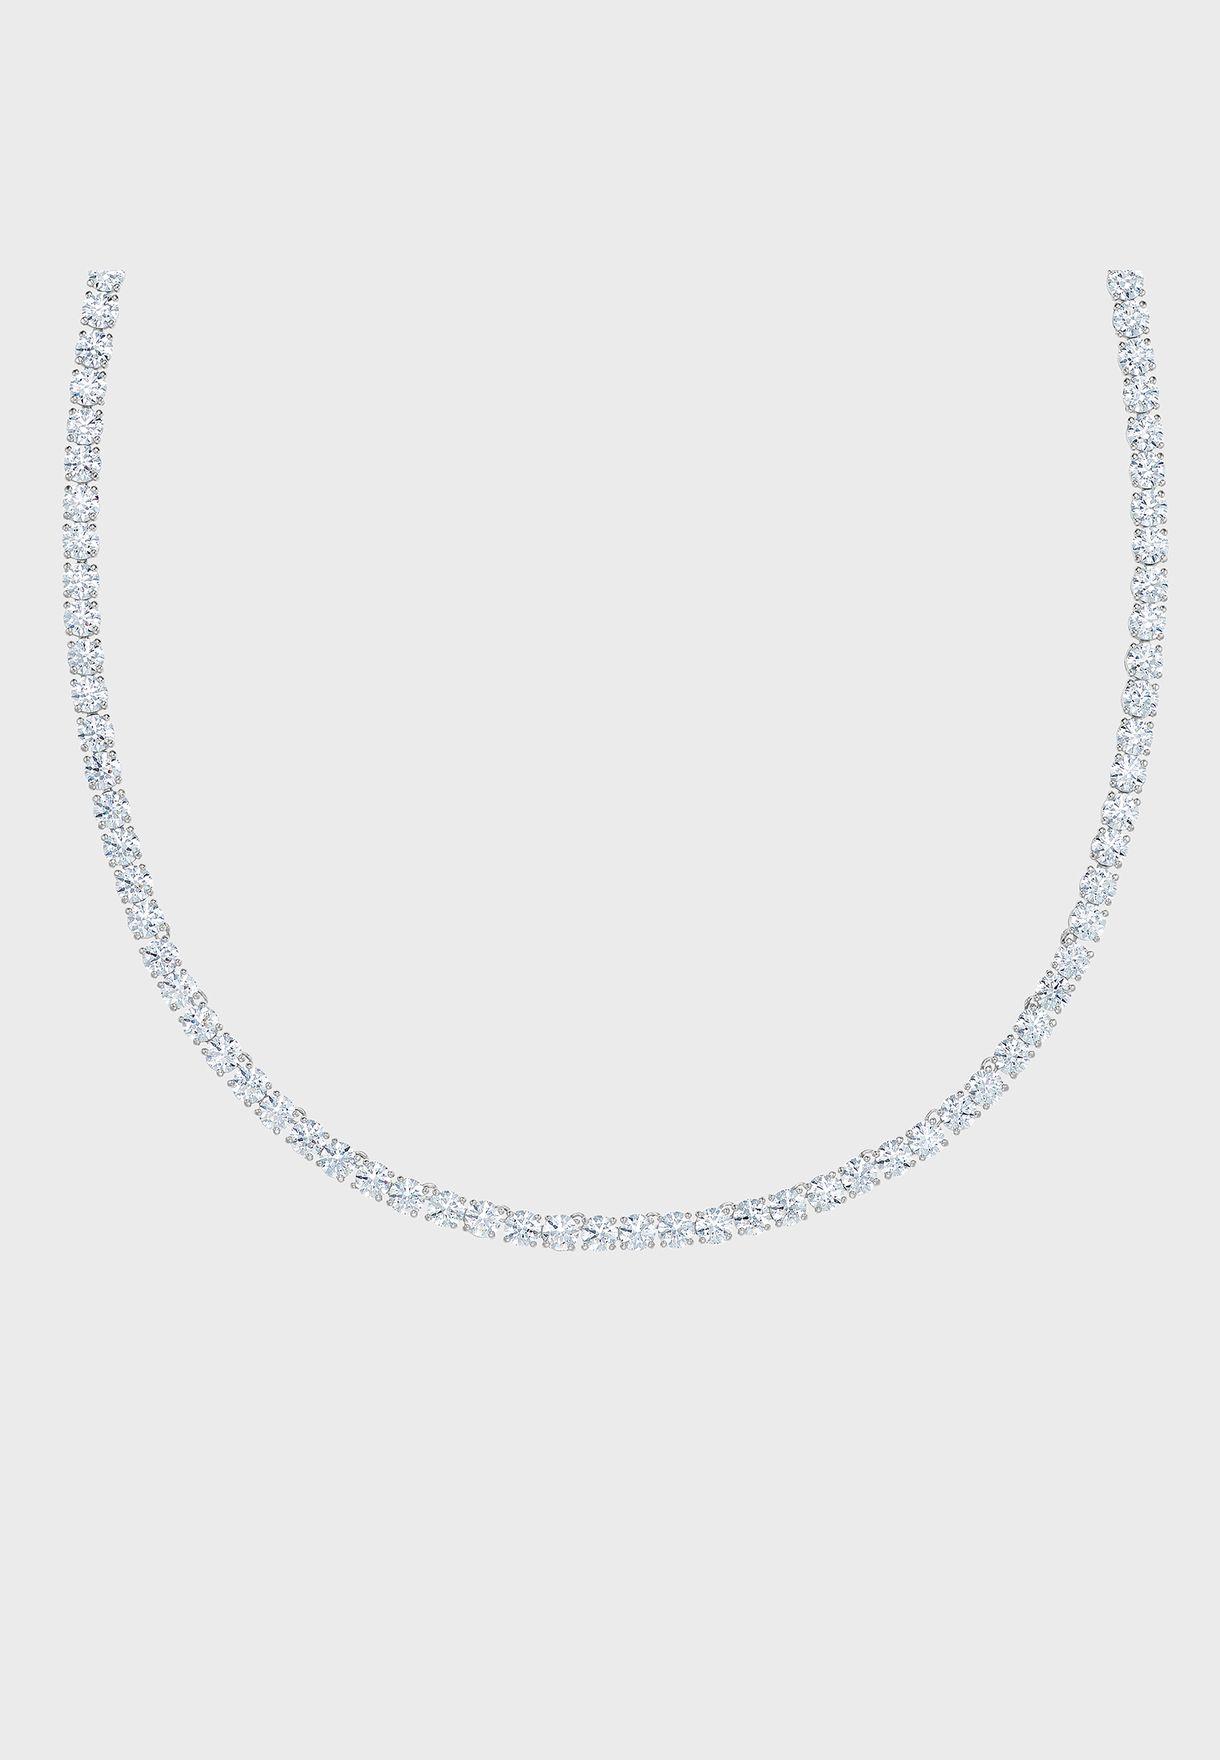 Tennis Deluxe Necklace+Earrings Set